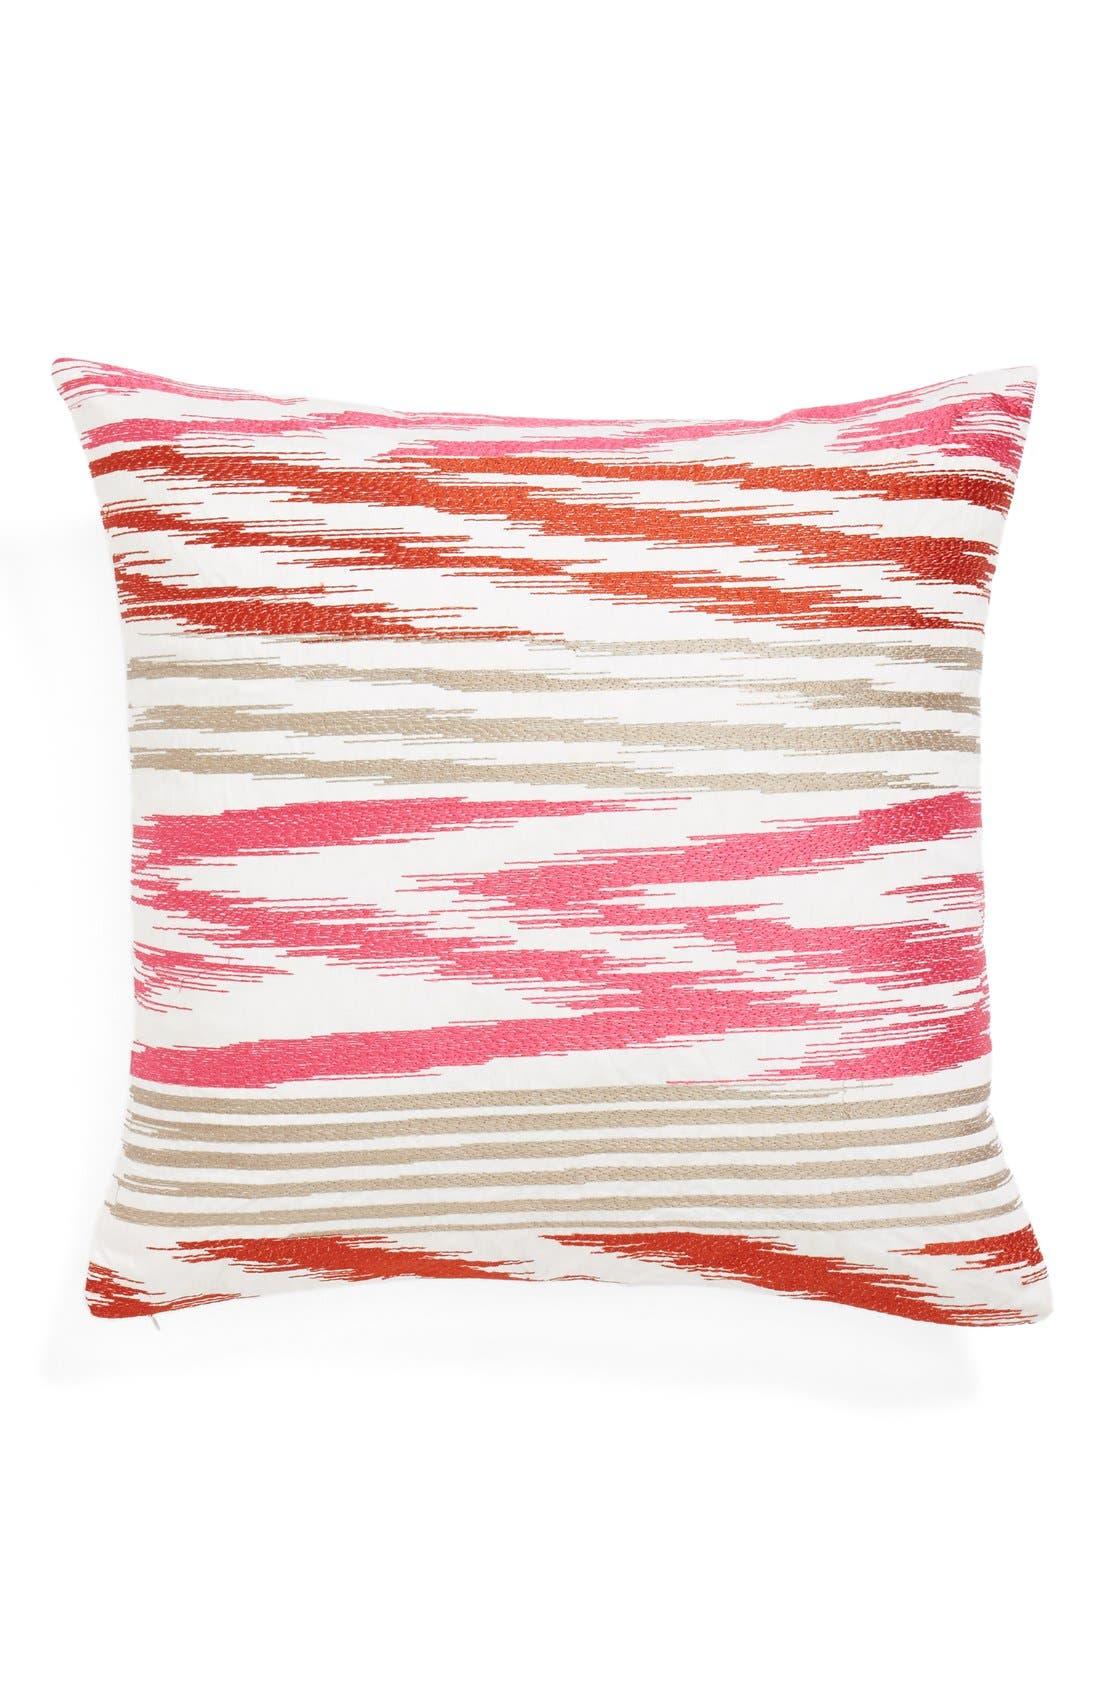 Alternate Image 1 Selected - zestt 'Ryan' Pillow